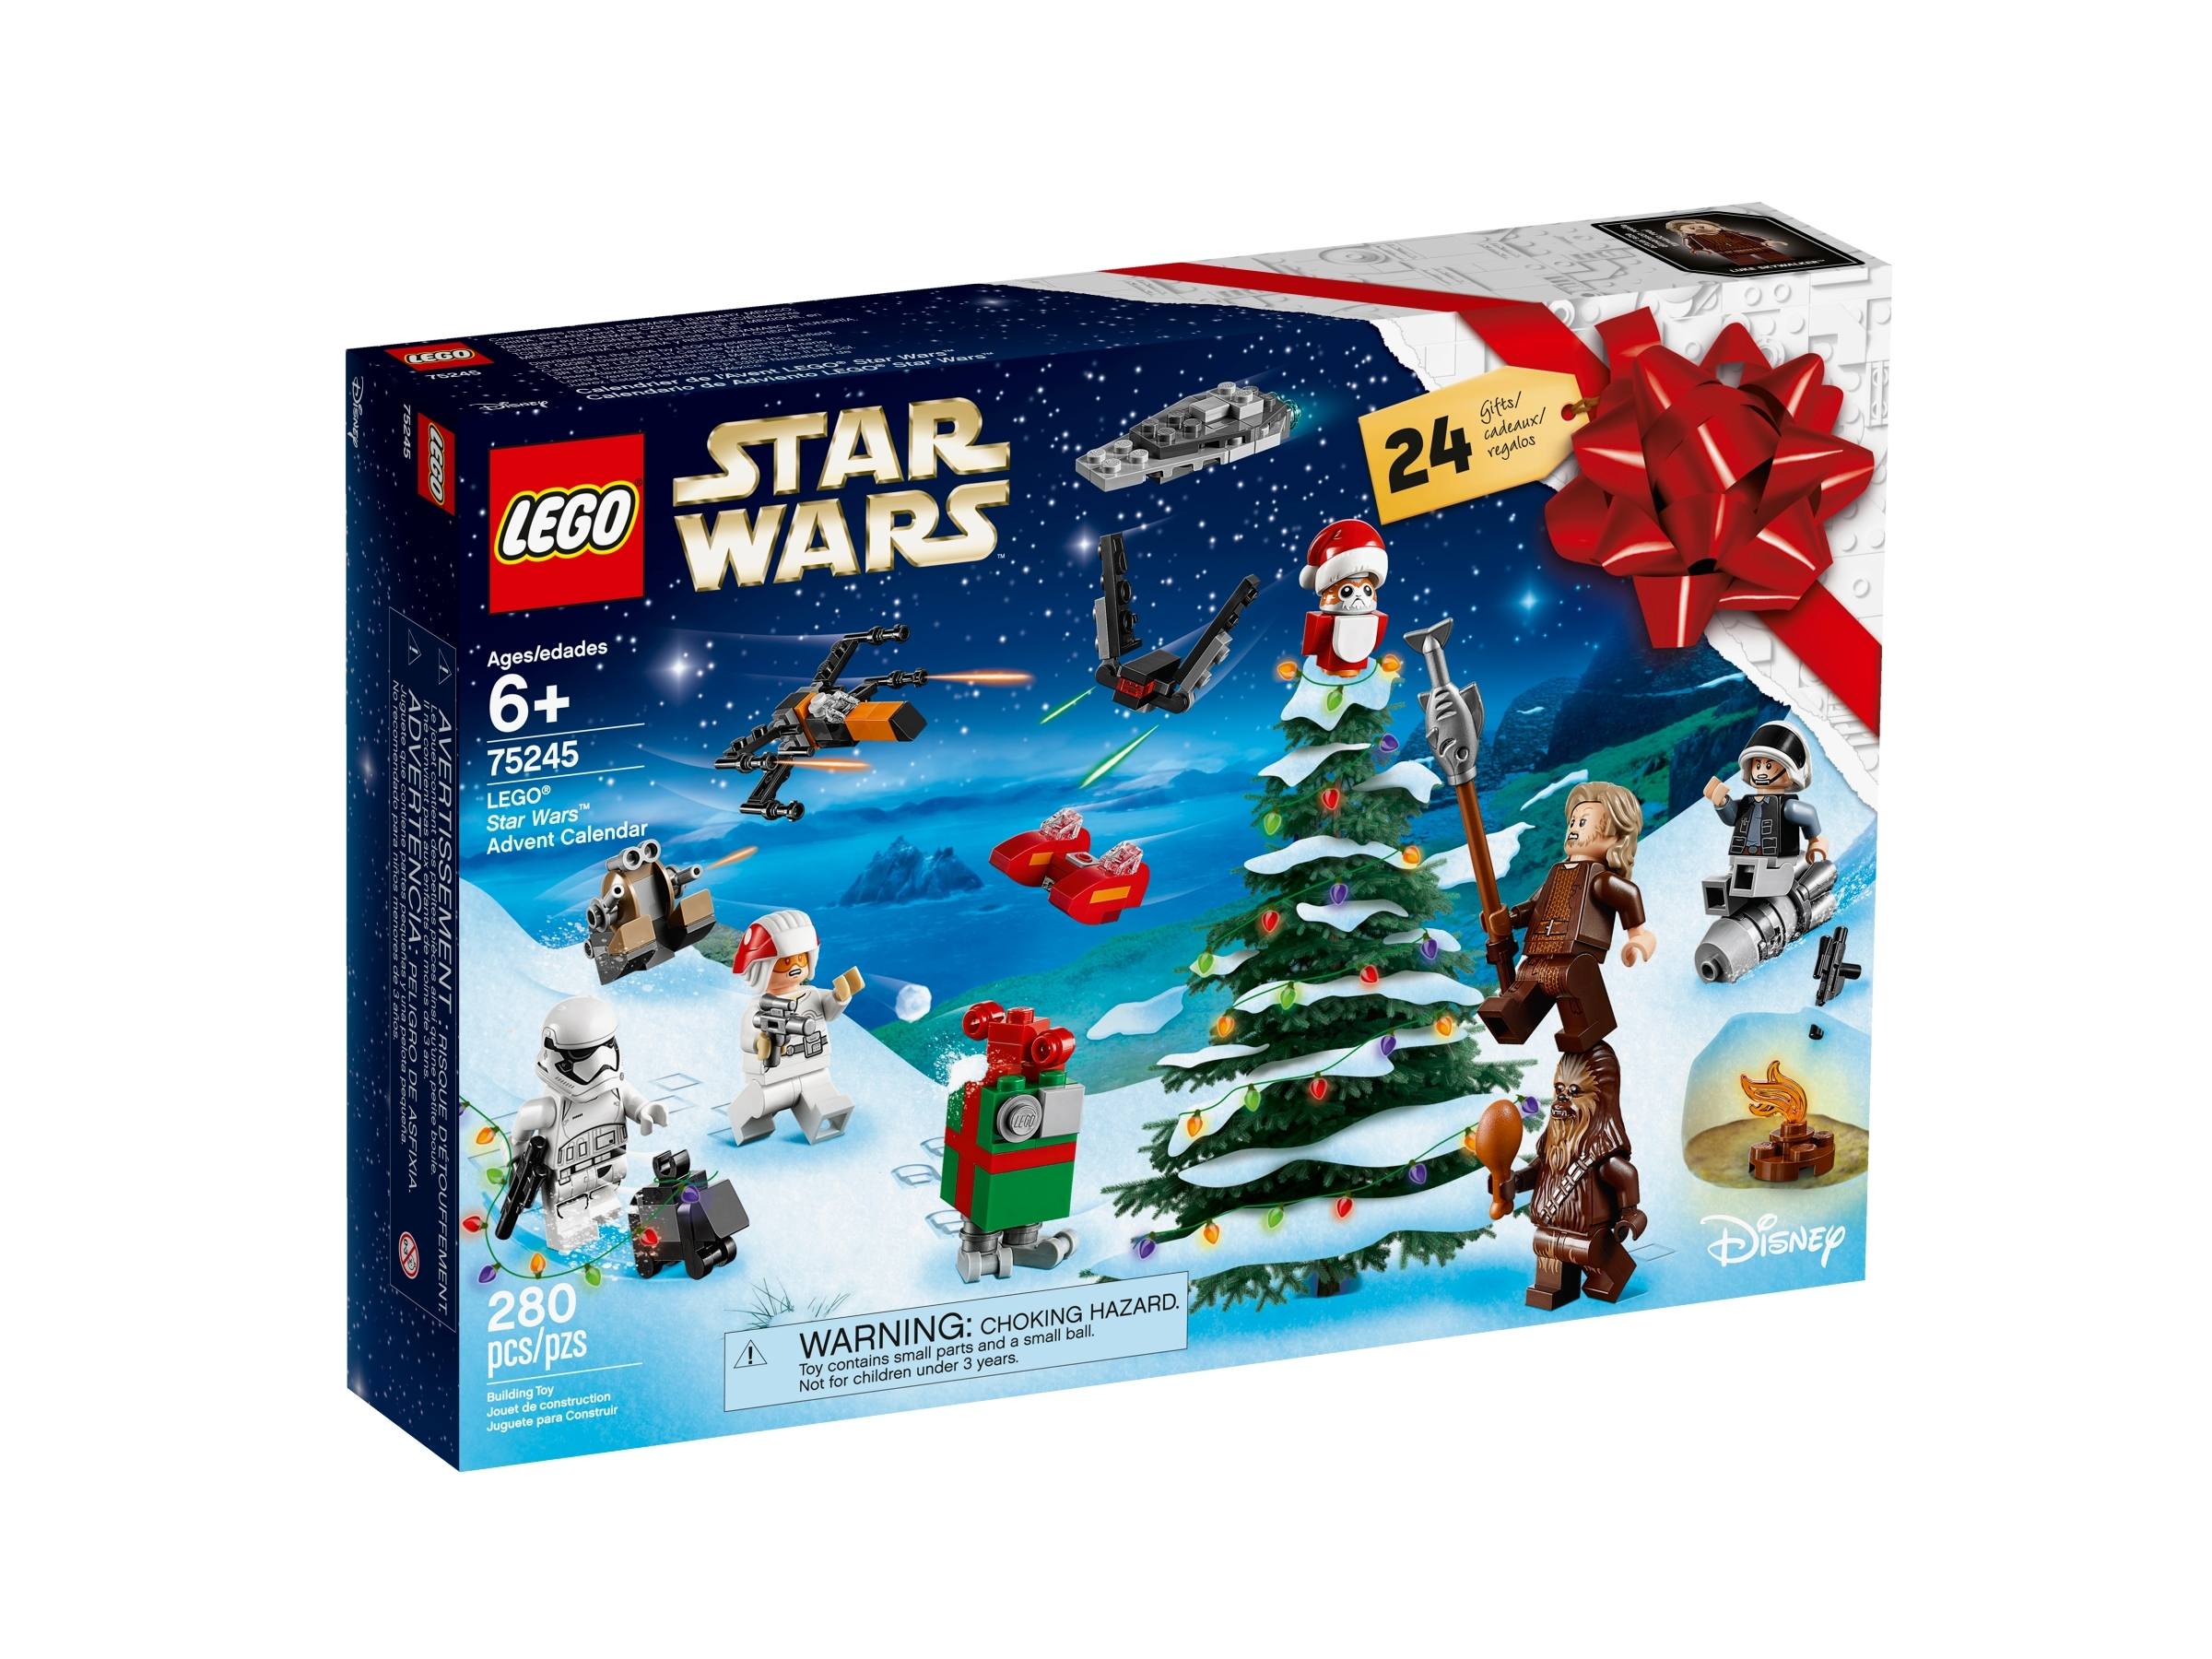 500 NEW LEGO PIECE LOT 3 MINIFIGS random brick figures movie star wars parts